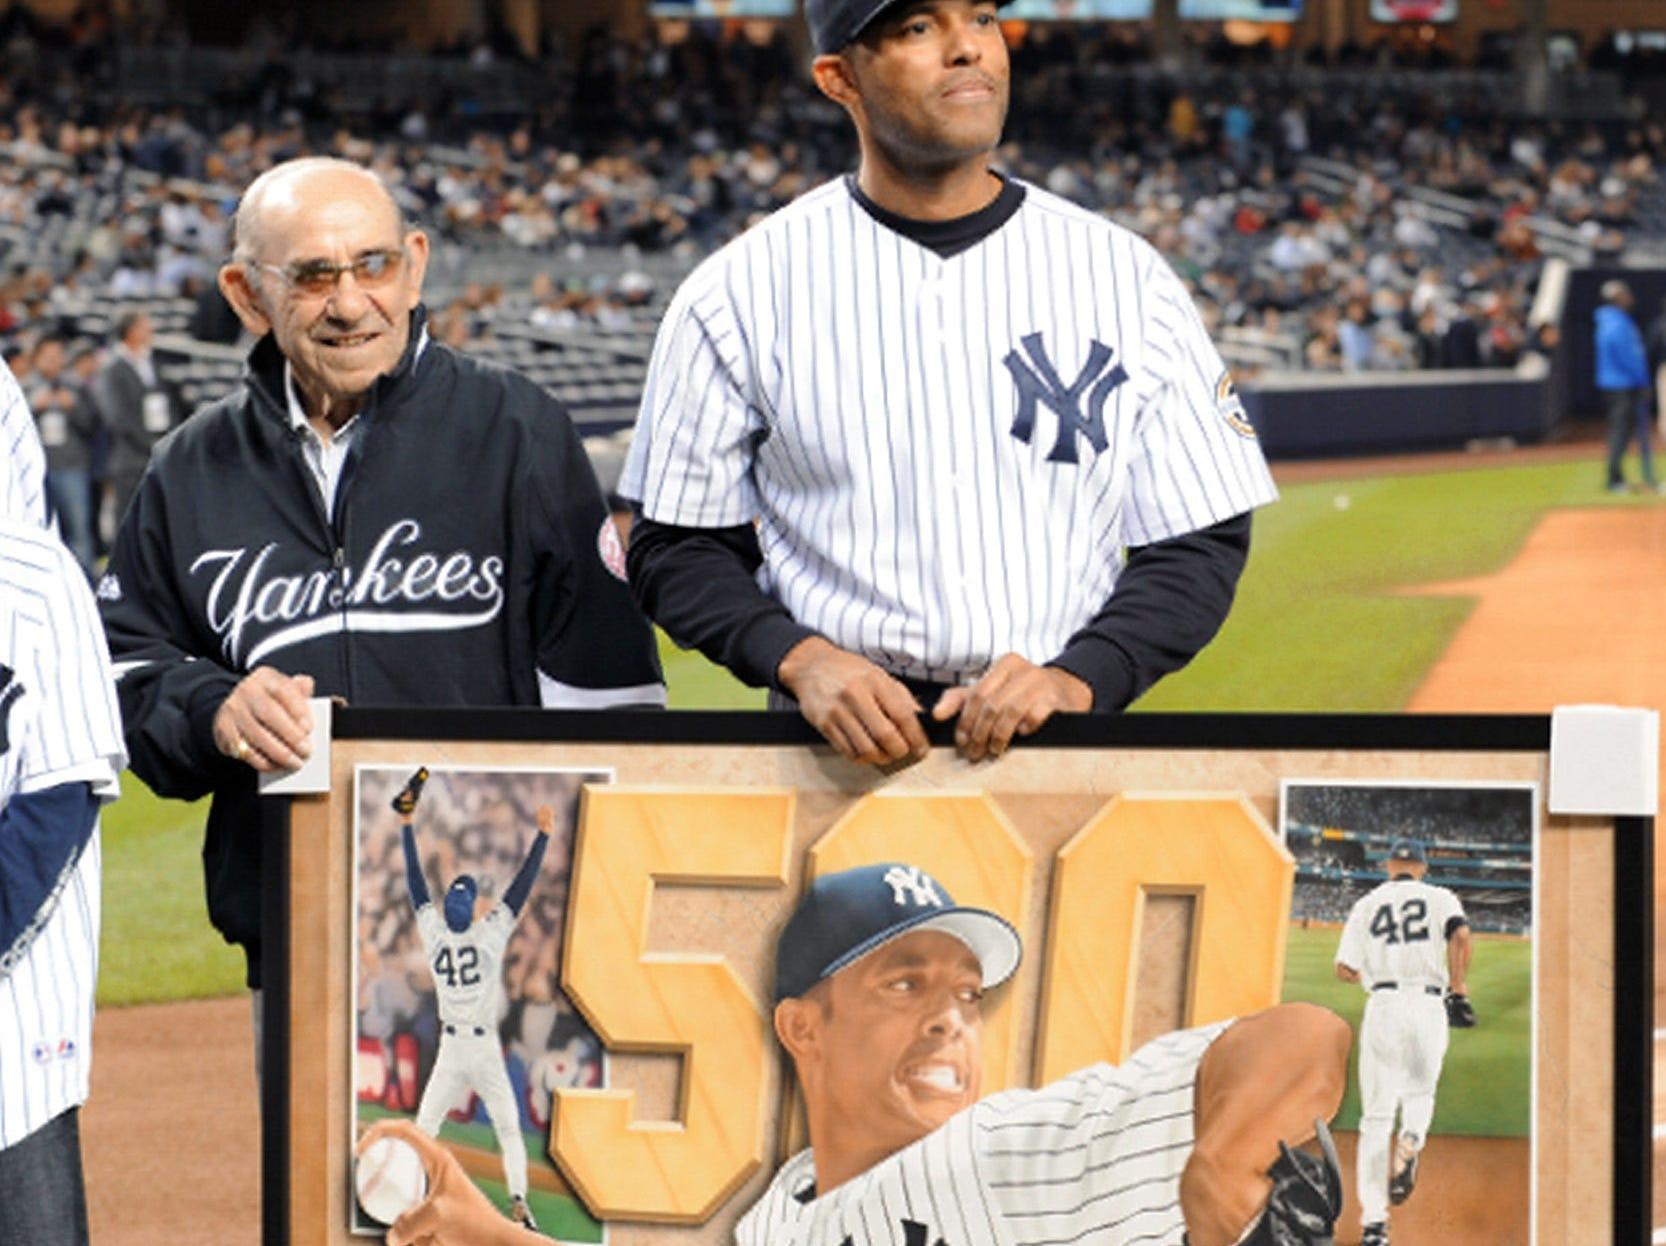 Yogi Berra and Mariano Rivera with a painting of Mariano.   New York Yankees against the Kansas City Royals at Yankee Stadium.